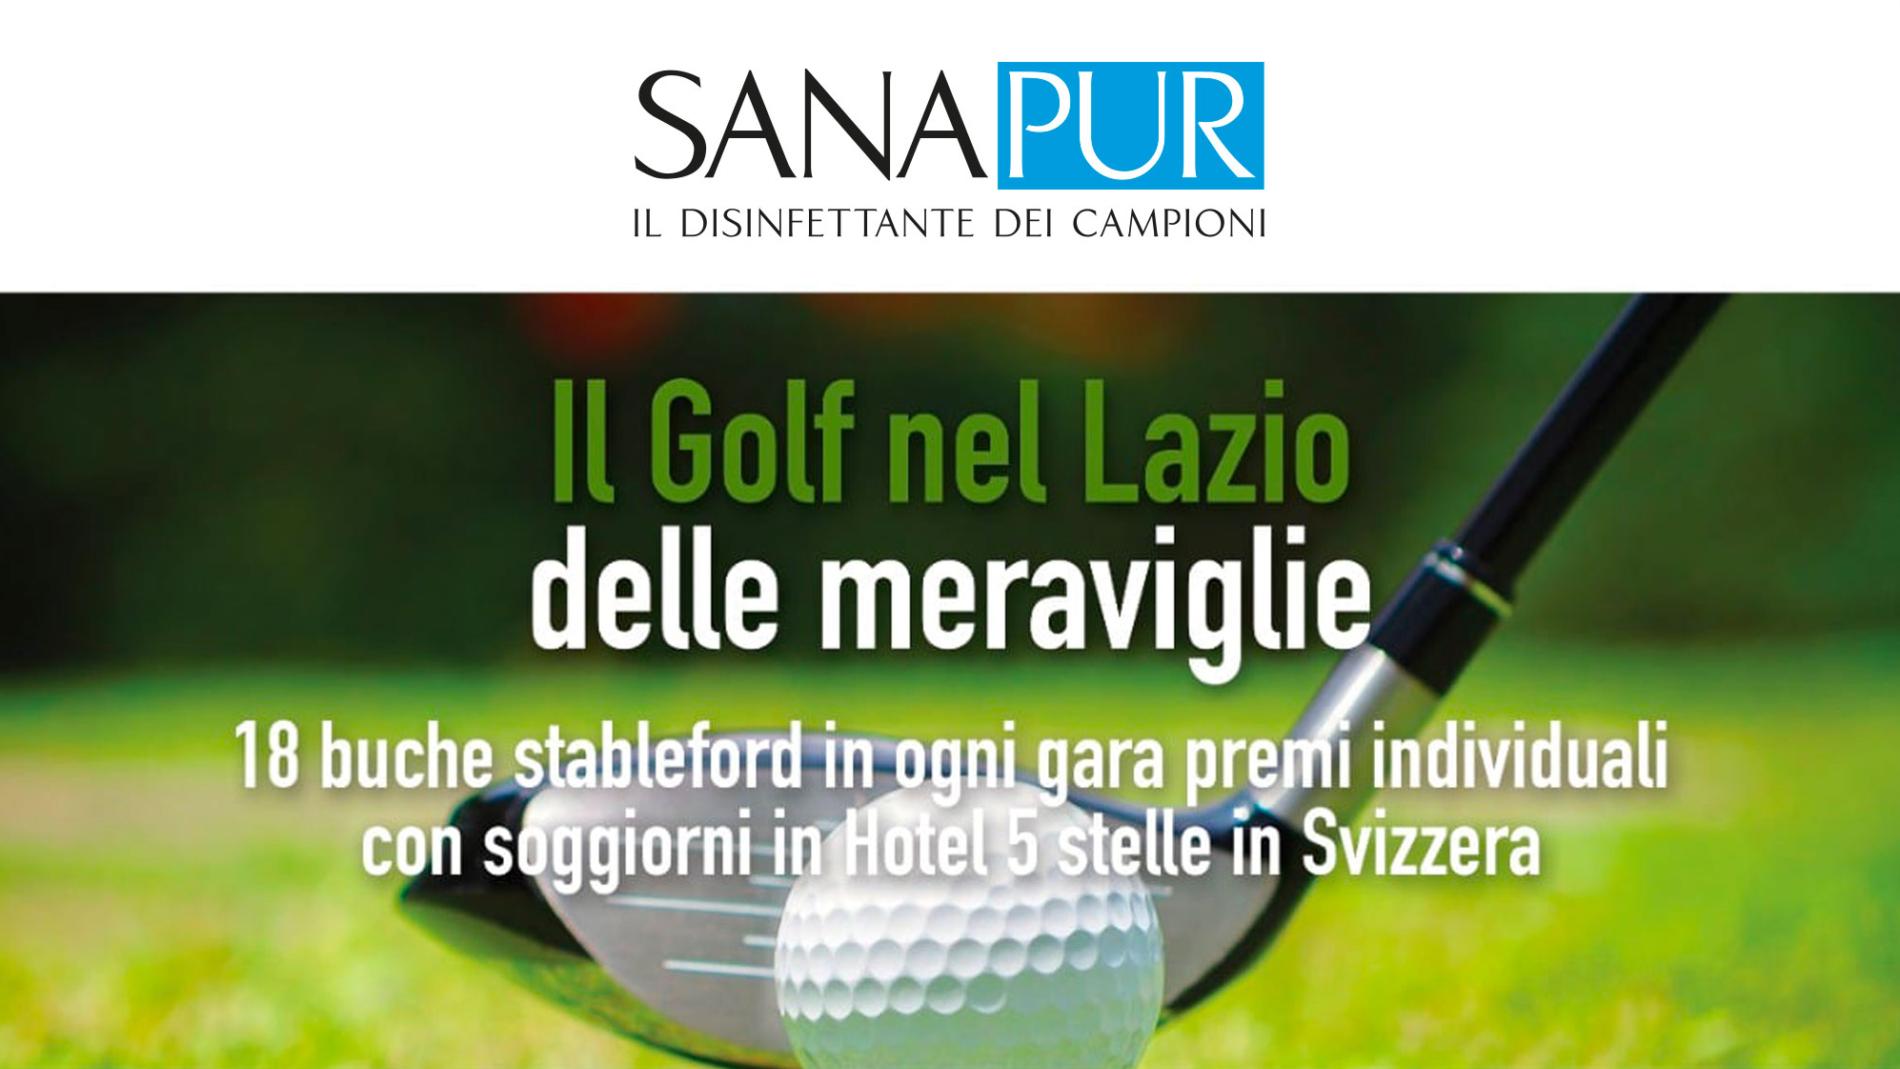 sanapur-sponsor-lazio-meraviglie-golf-copertina-s2life